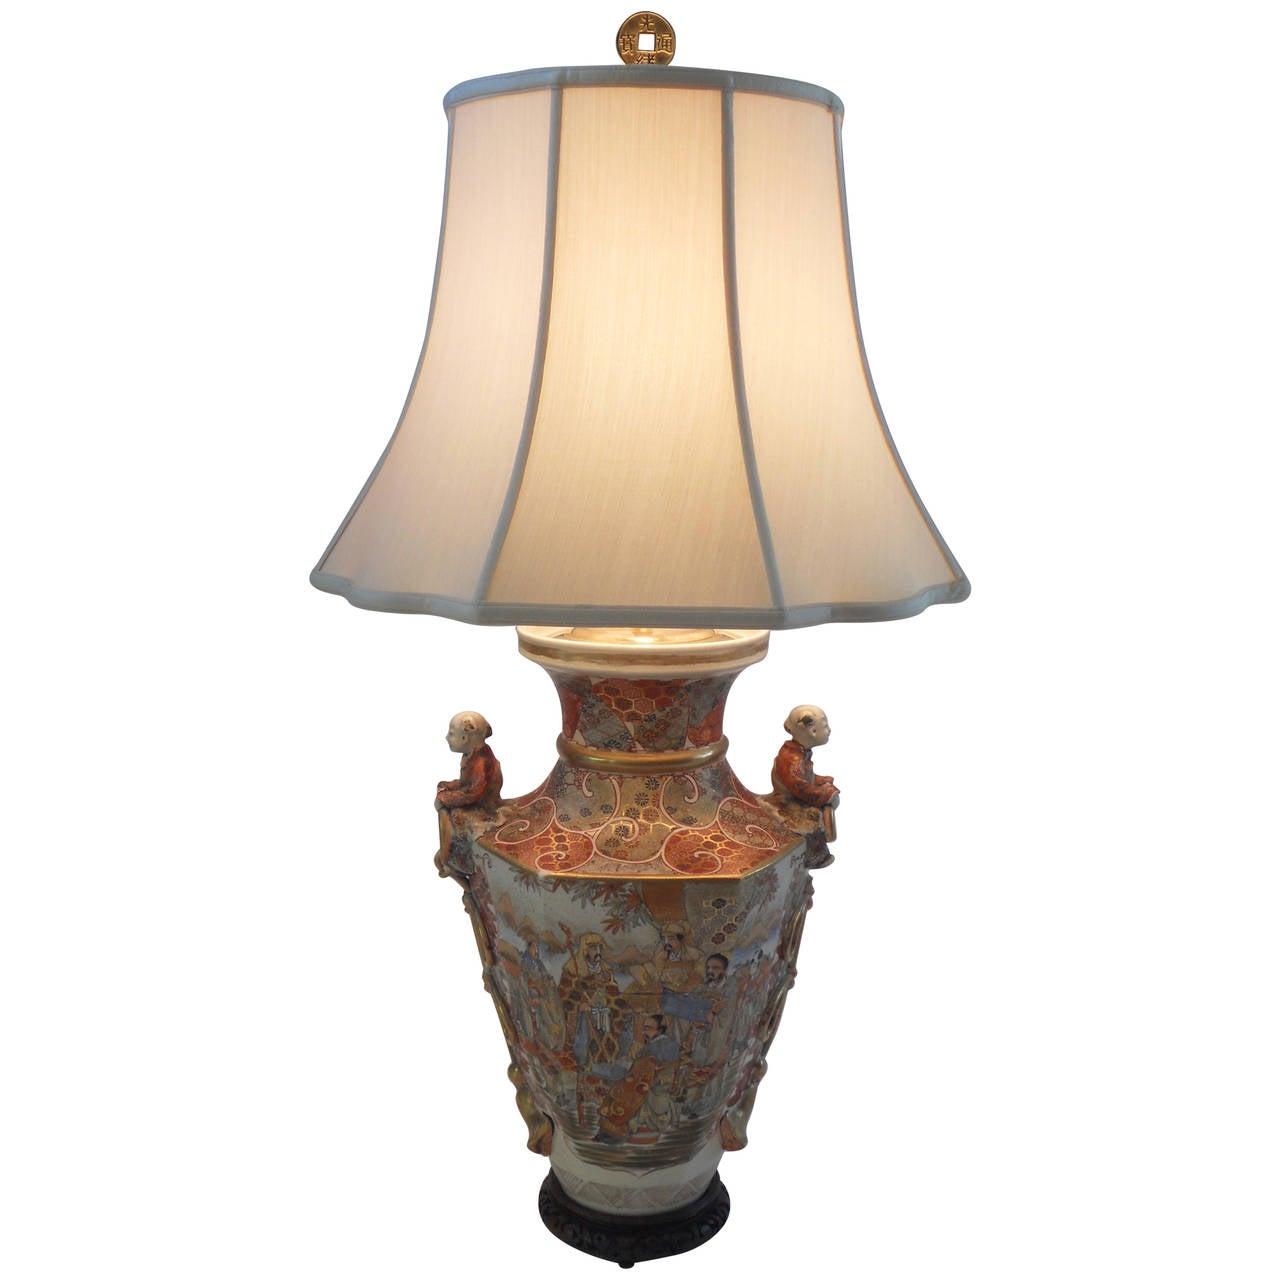 19th Century Satsuma Vase as a Lamp